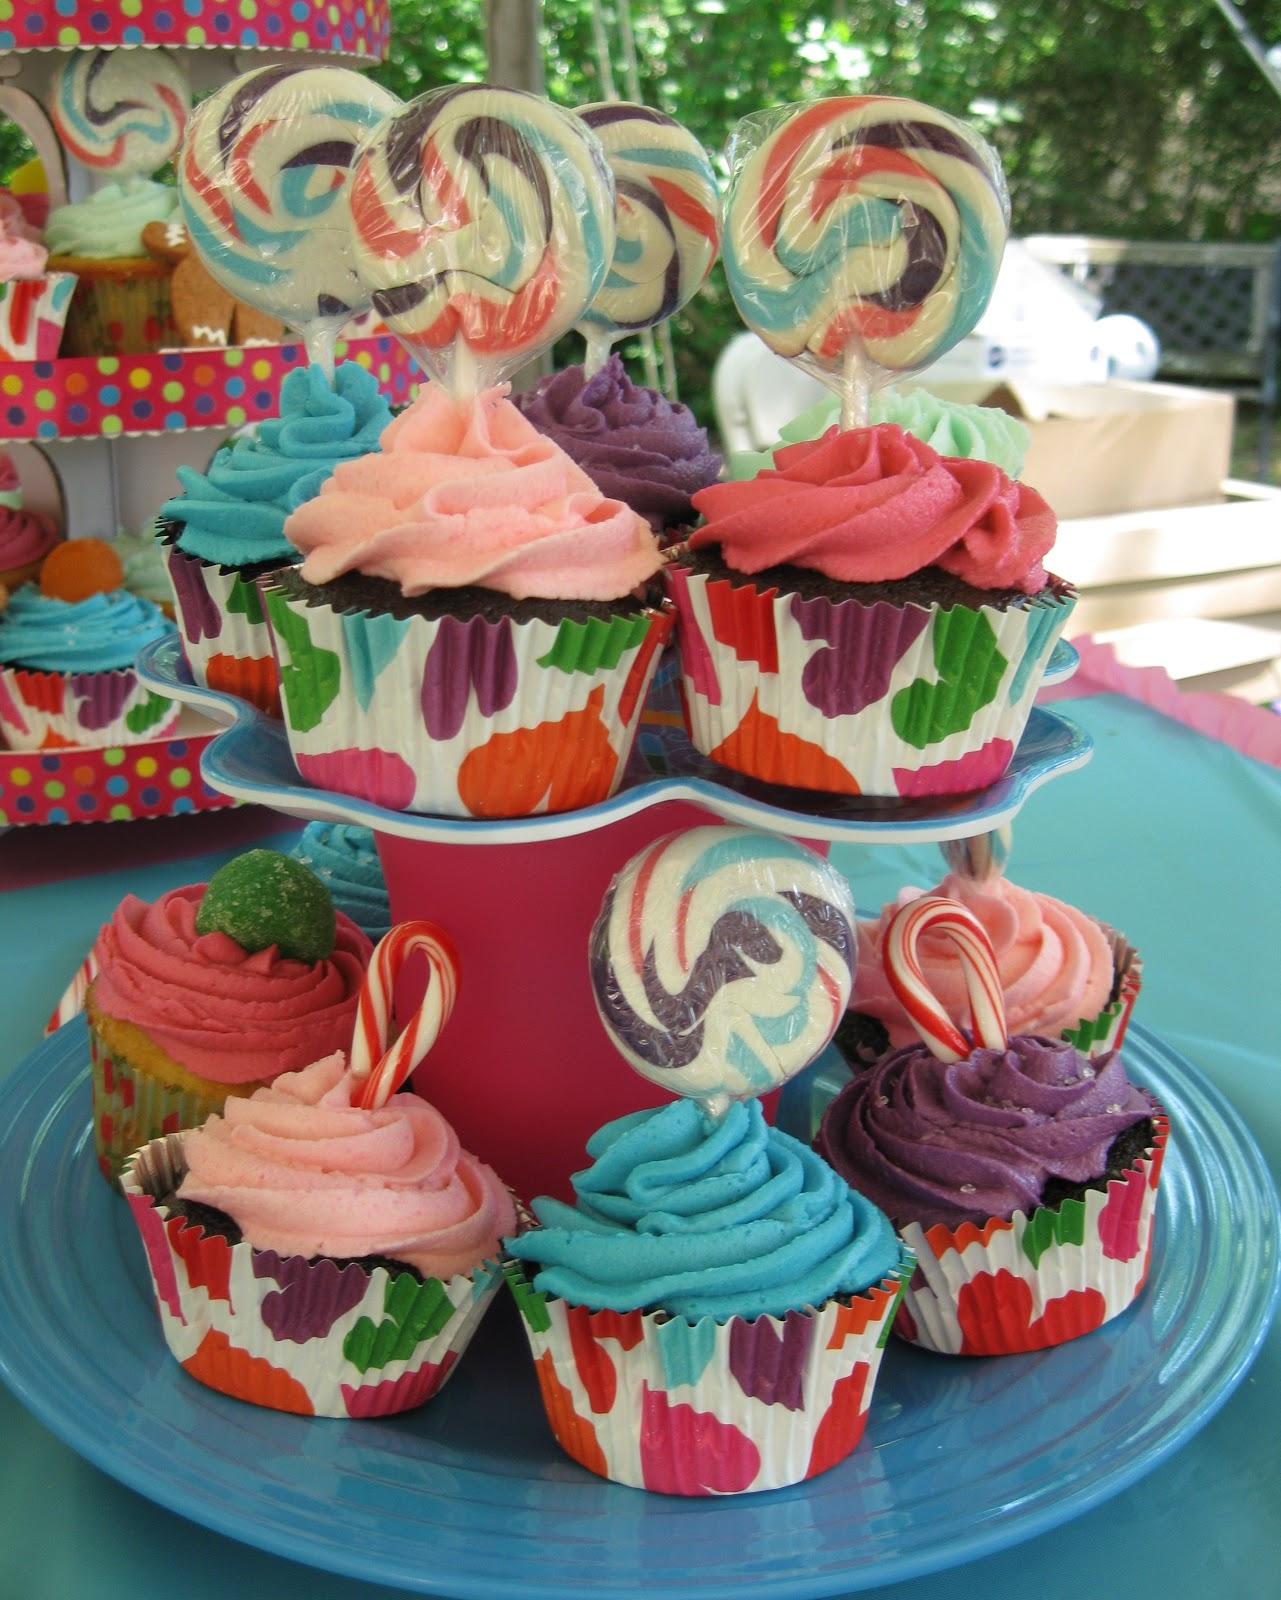 Easy Birthday Cake Ideas: Baking Outside The Box: Super-Easy Birthday Cake Ideas